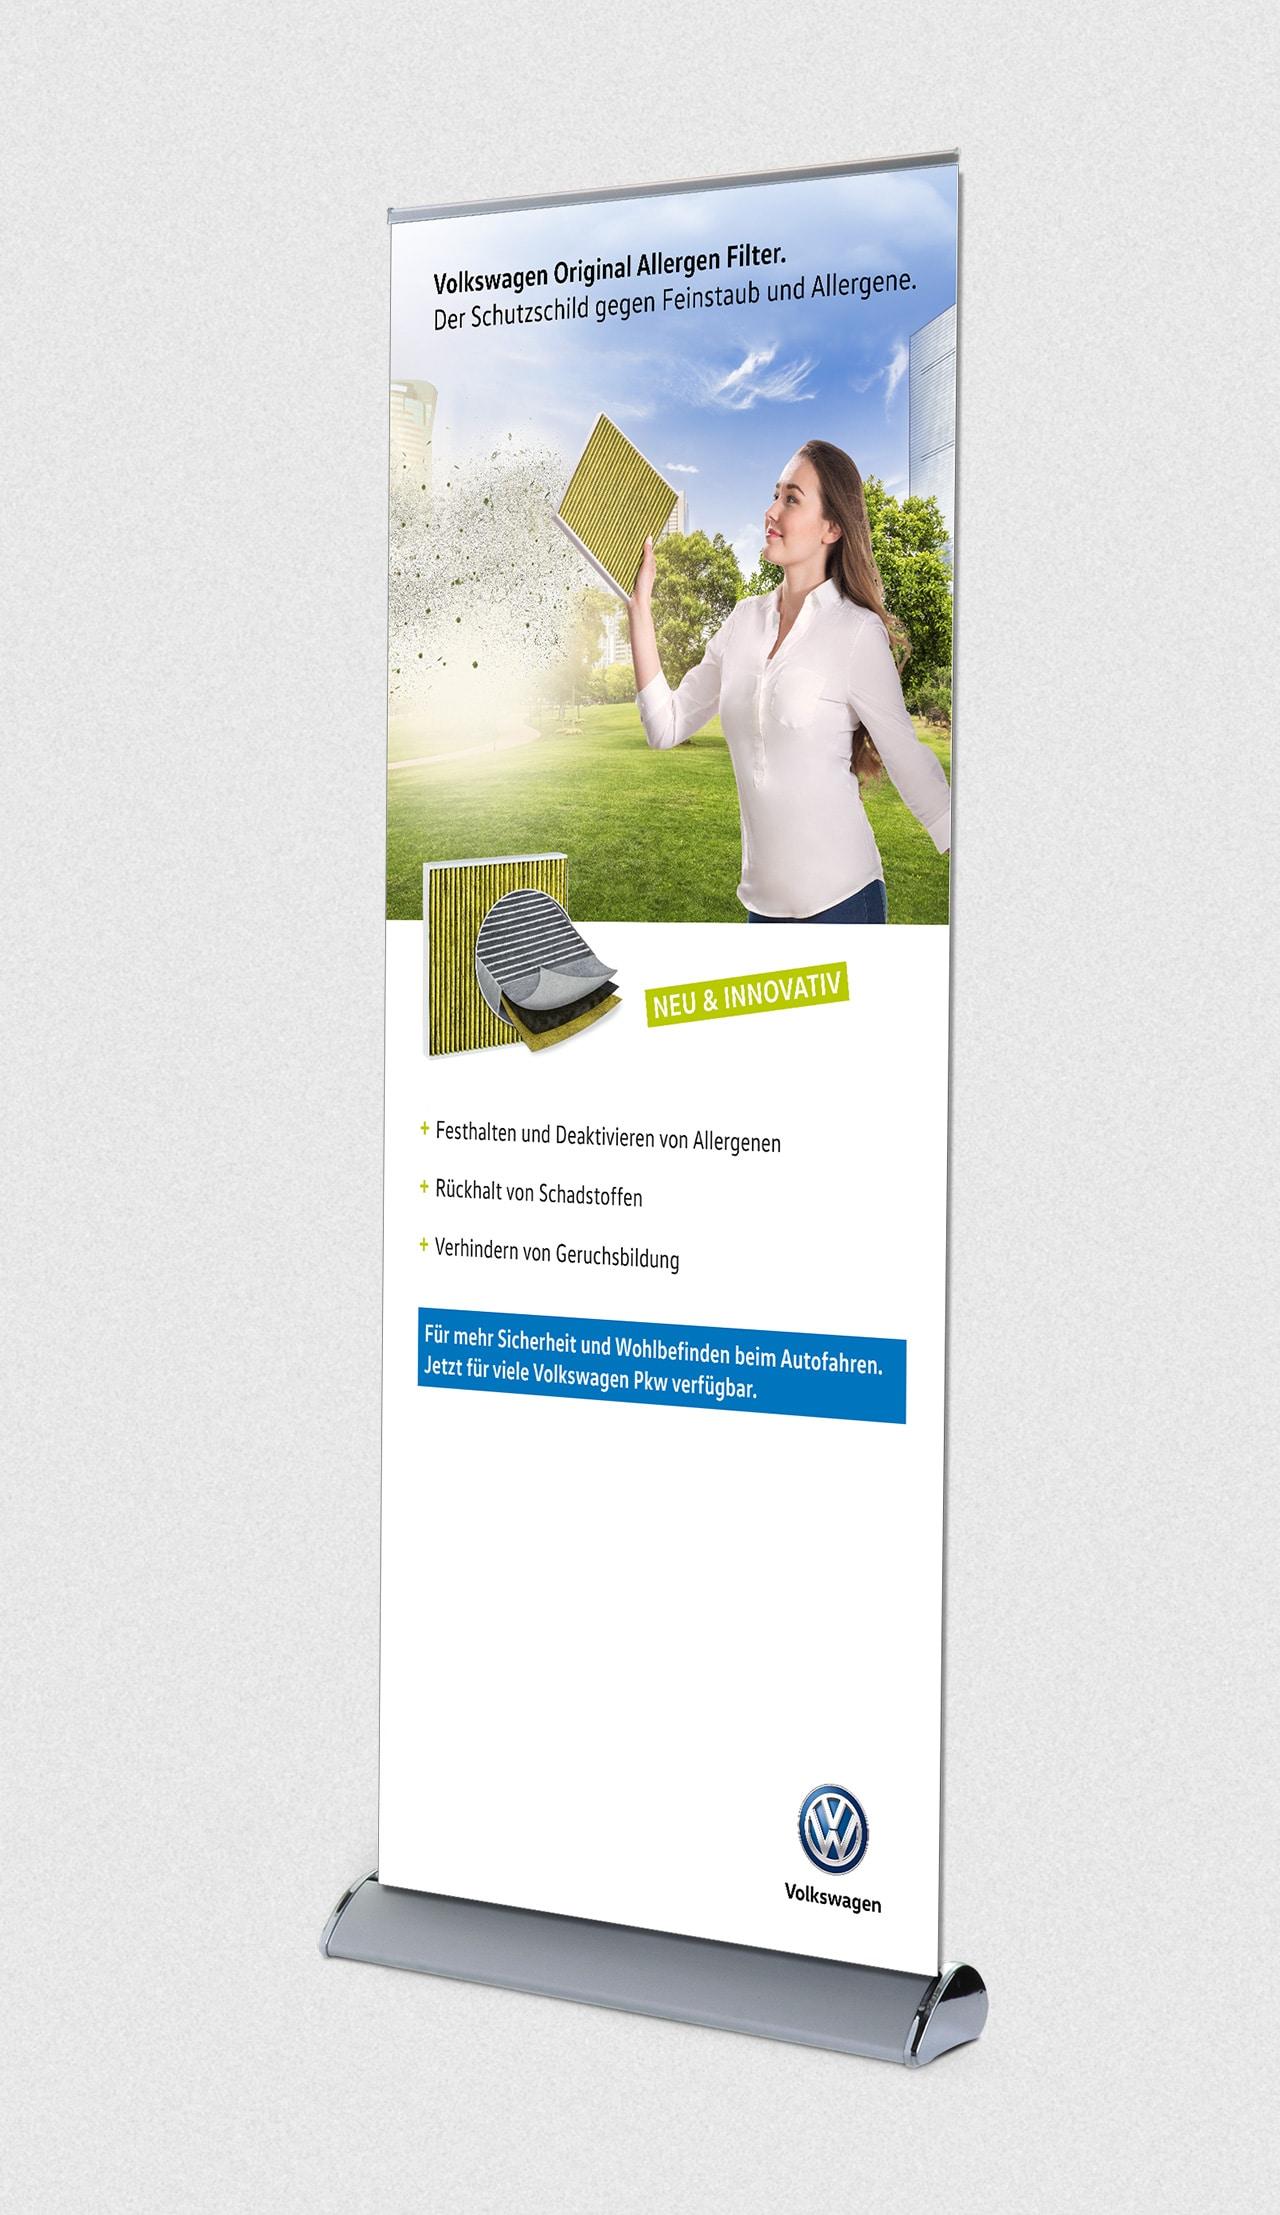 intonic werbeagentur vw kampagne allergenfilter rollup